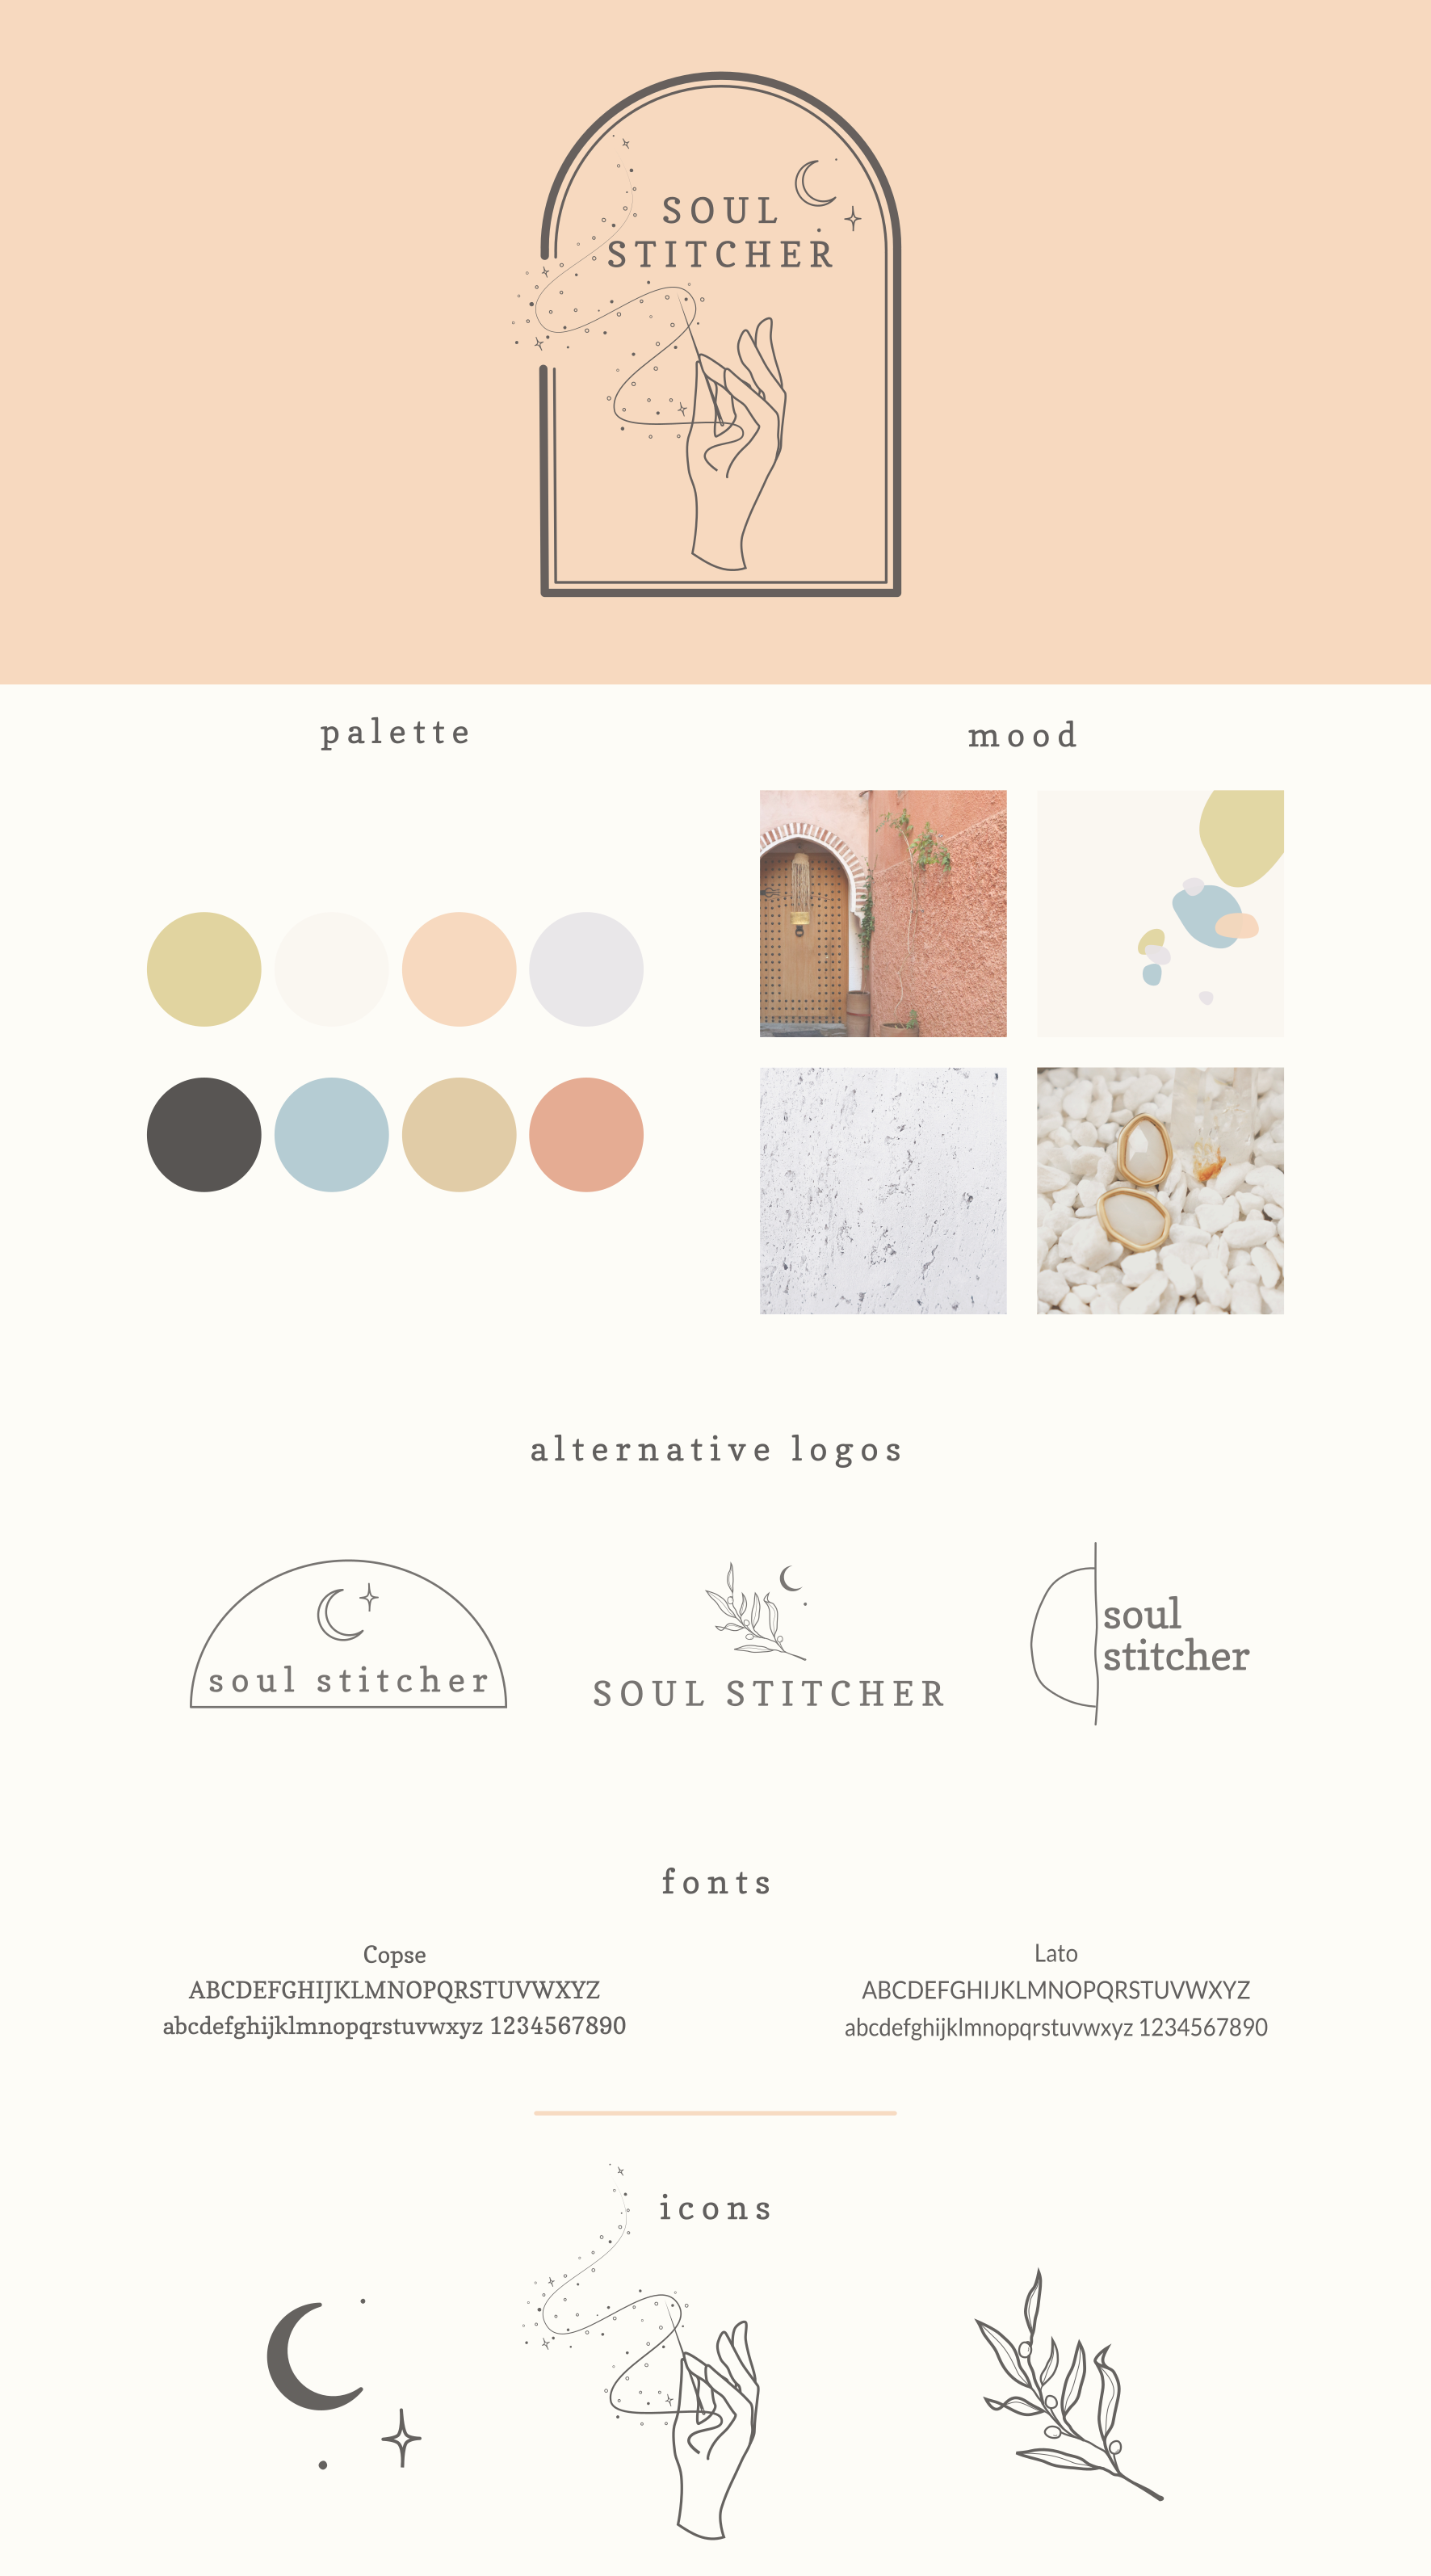 Soul Stitcher Branding Board Branding Design Logo Branding Design Inspiration Graphic Design Branding